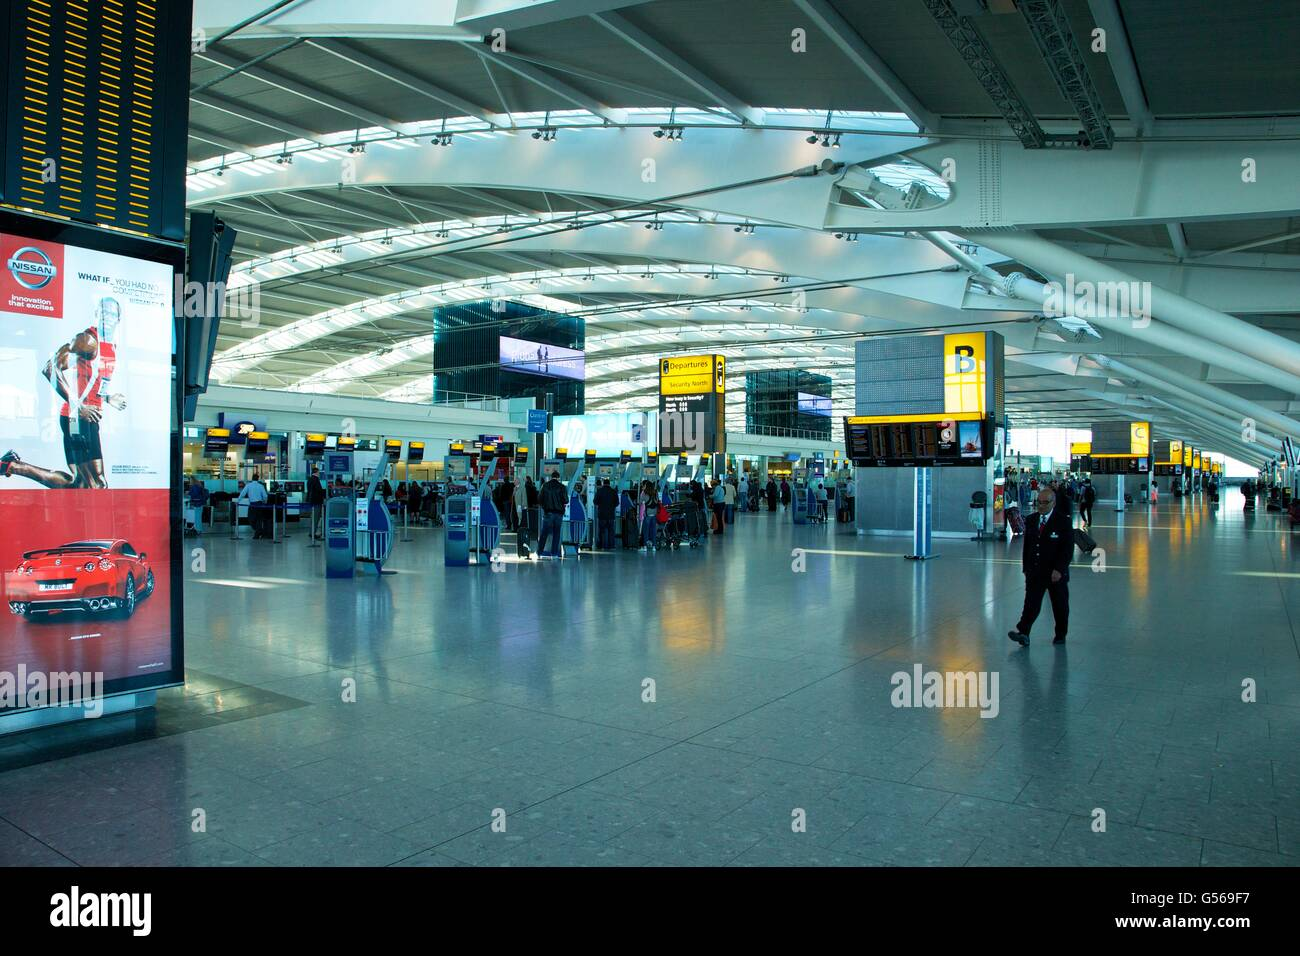 Interior of Terminal 5, Heathrow Airport,  London, England, UK, GB, - Stock Image